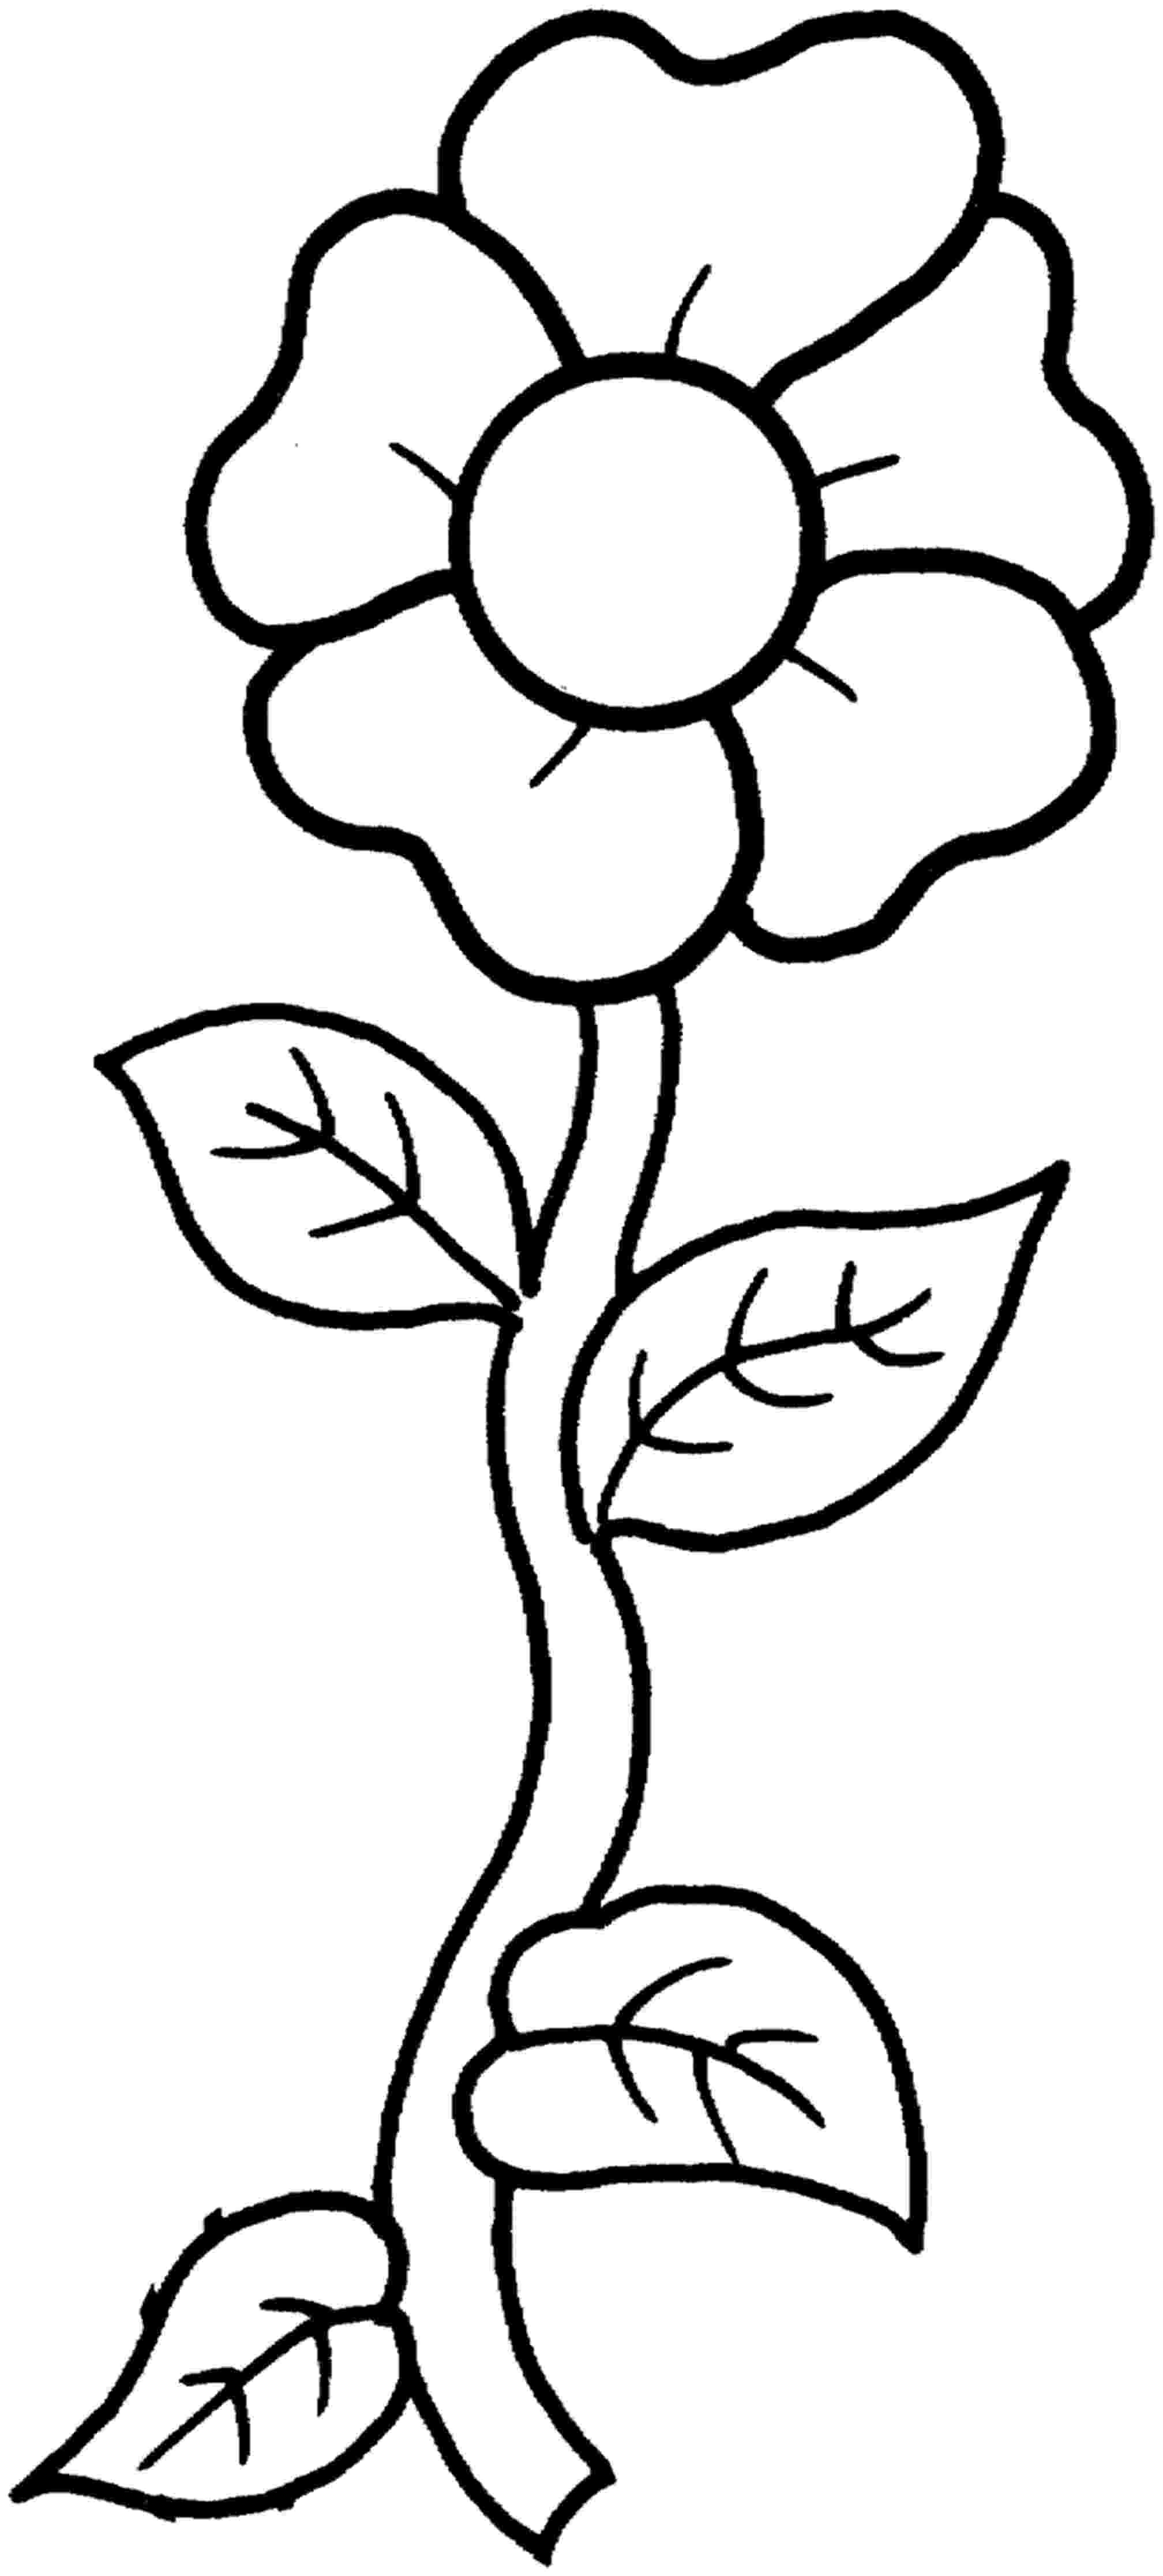 flower coloring sheets for kids free printable flower coloring pages for kids best sheets for coloring flower kids